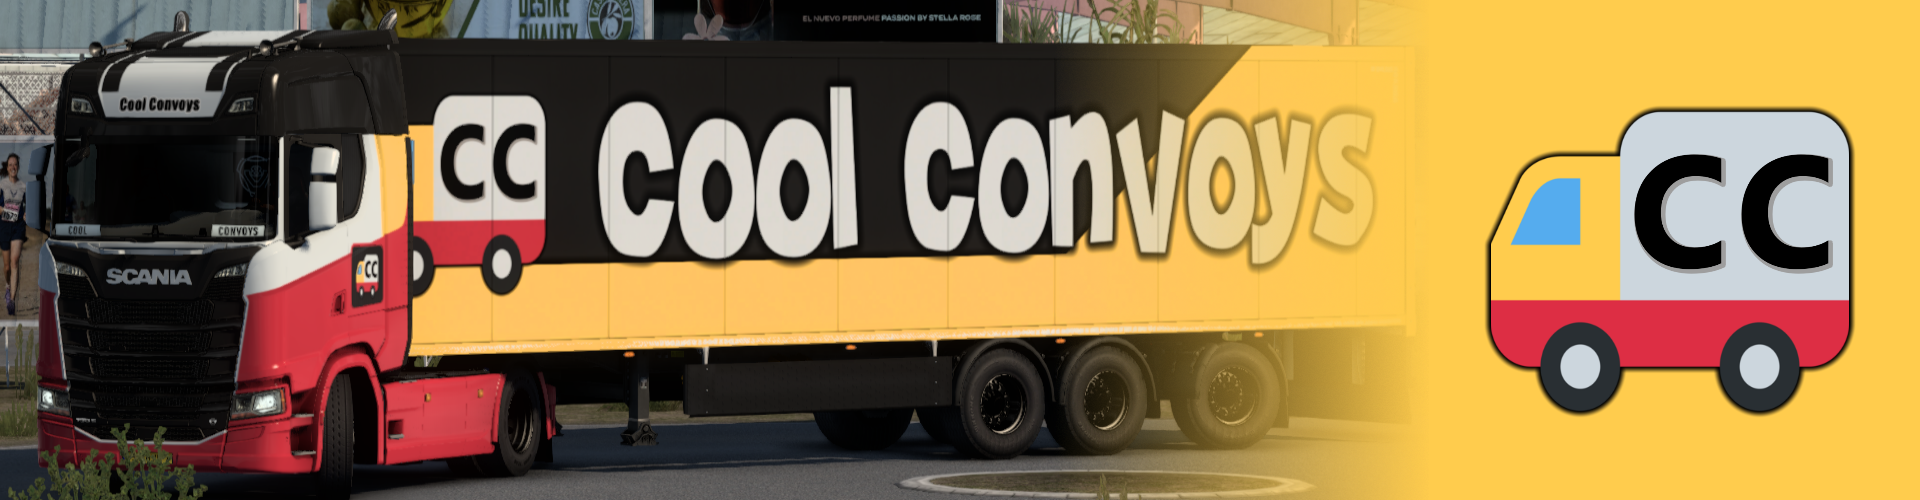 Cool Convoy #30